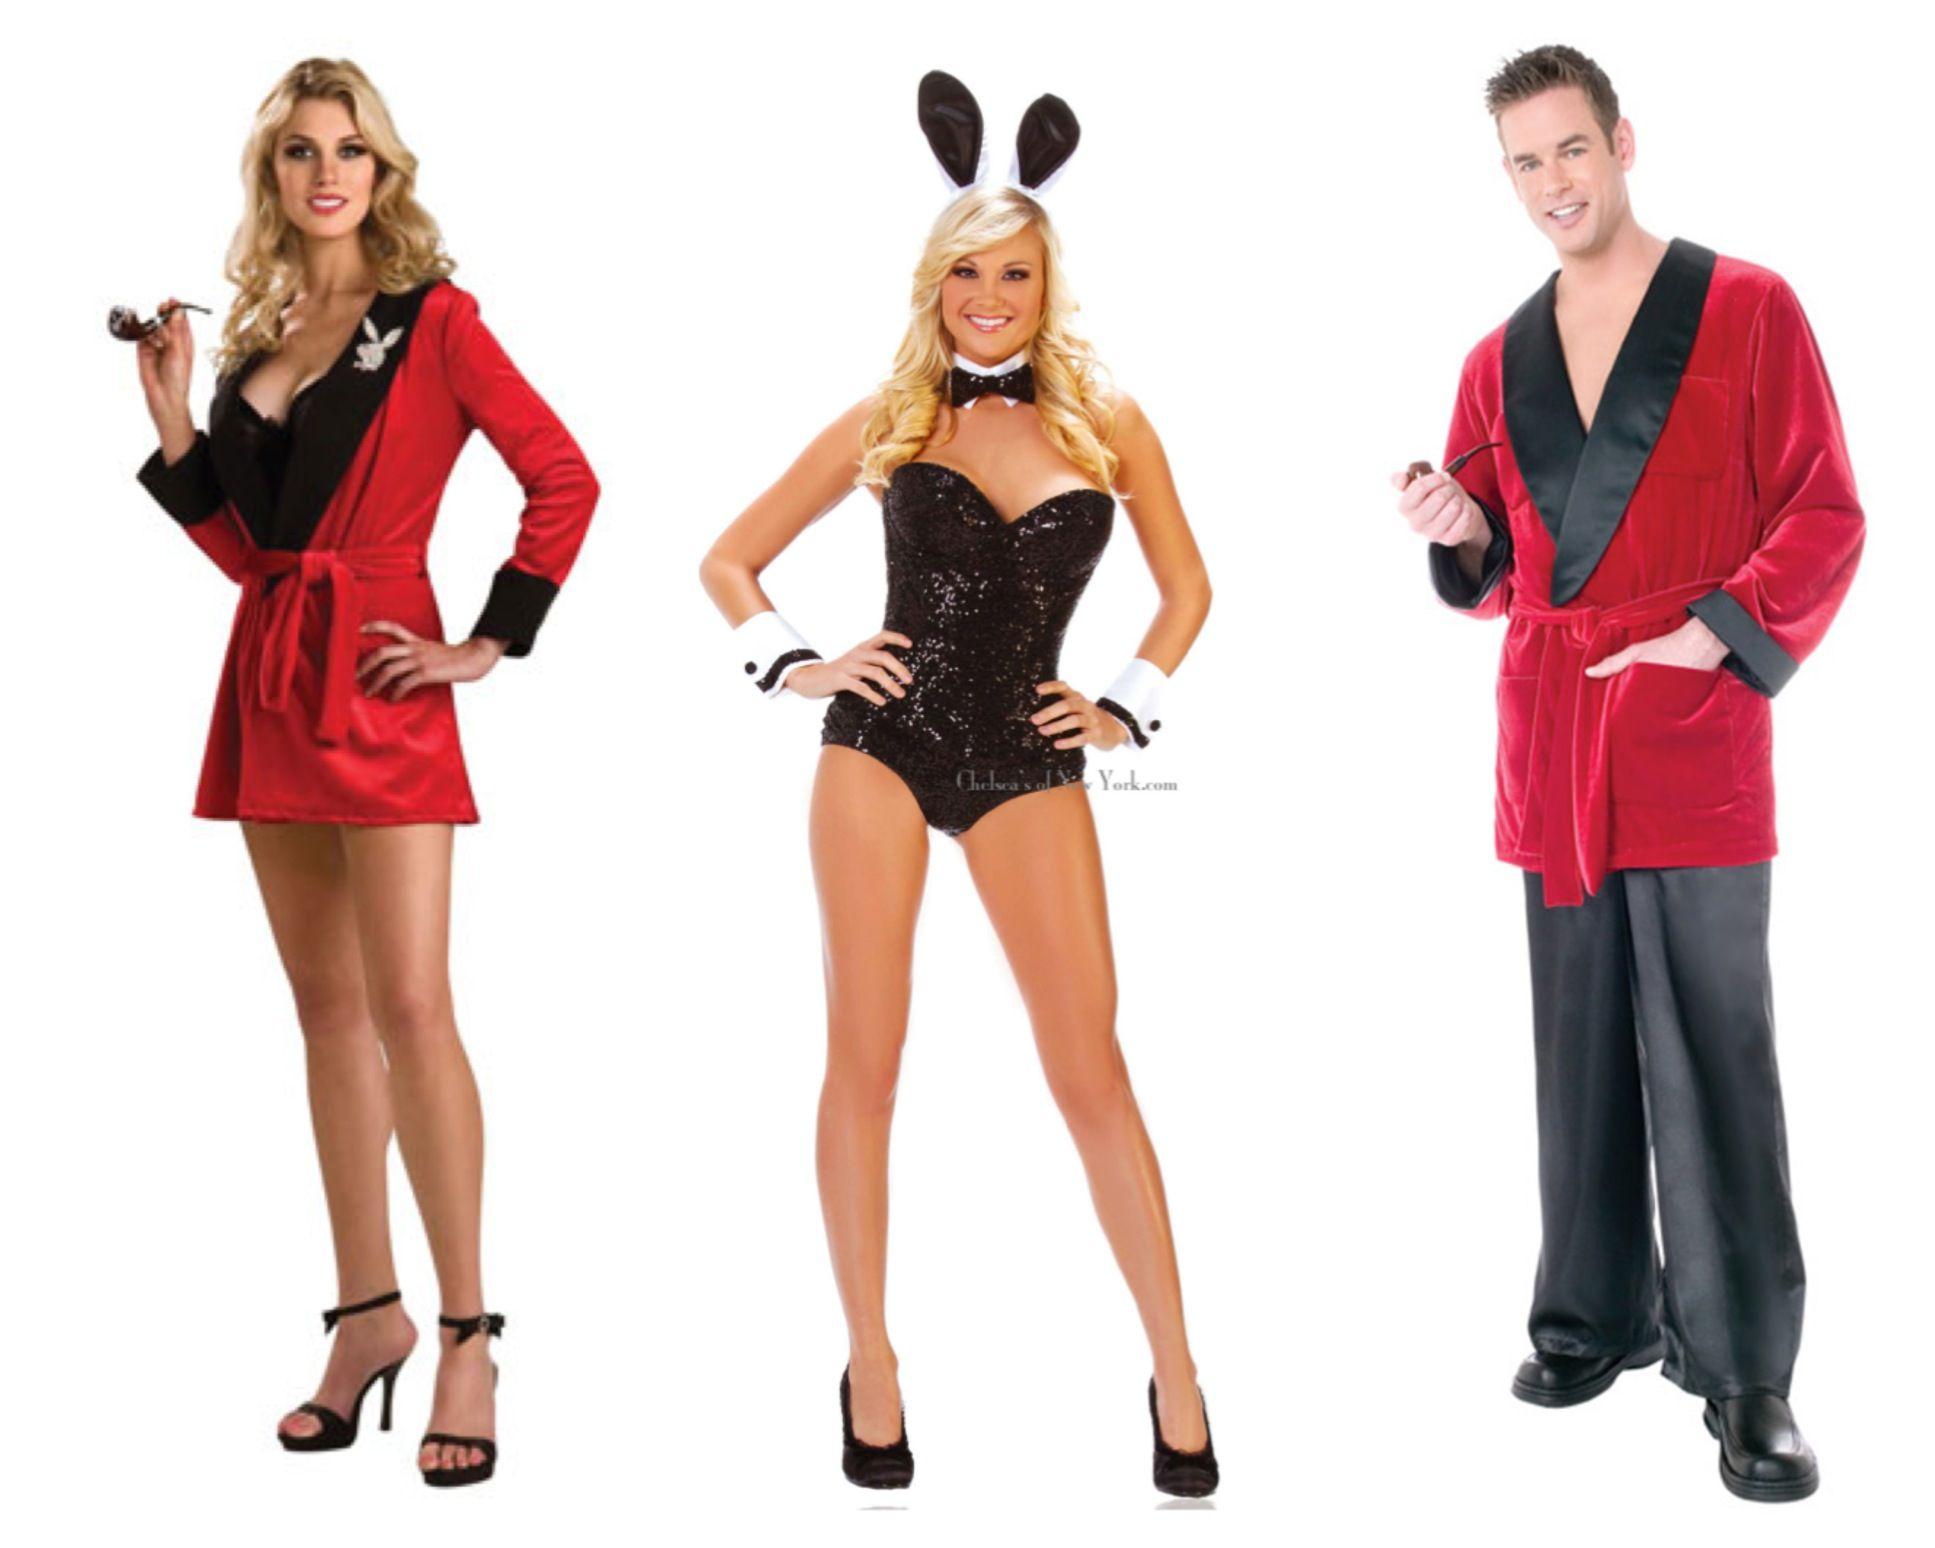 Best 25+ Hugh hefner costume ideas only on Pinterest | Playboy ...